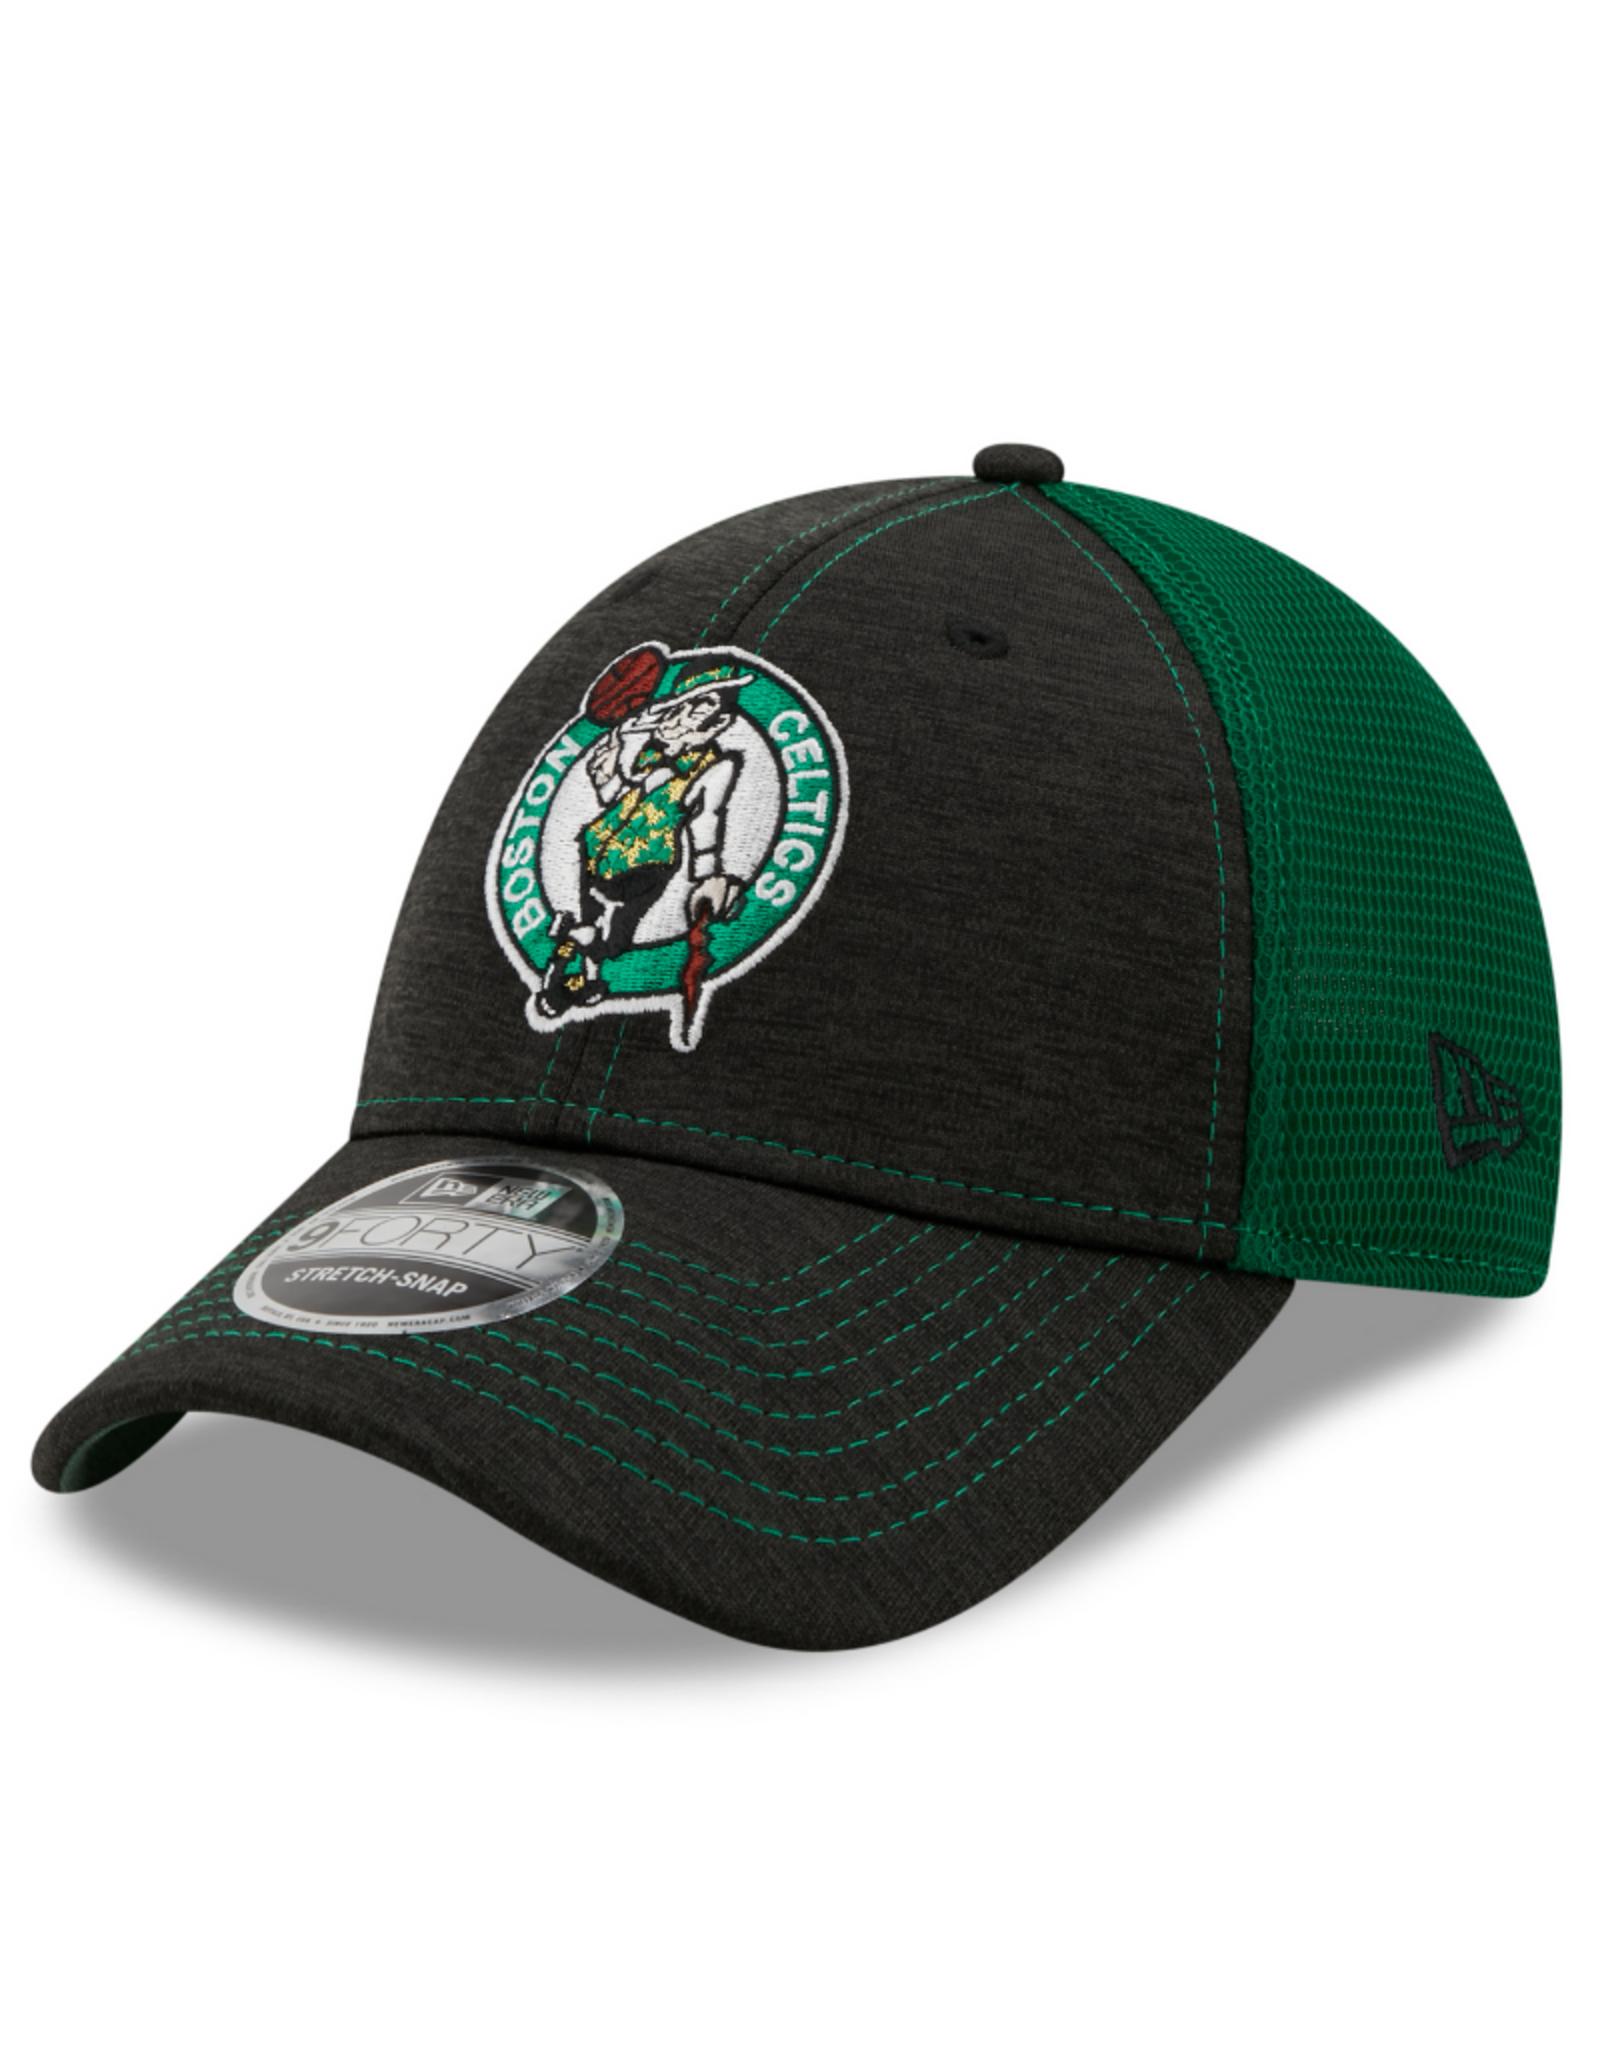 New Era Adult 9FORTY STH Neo B3 Hat Boston Celtics Grey/Green